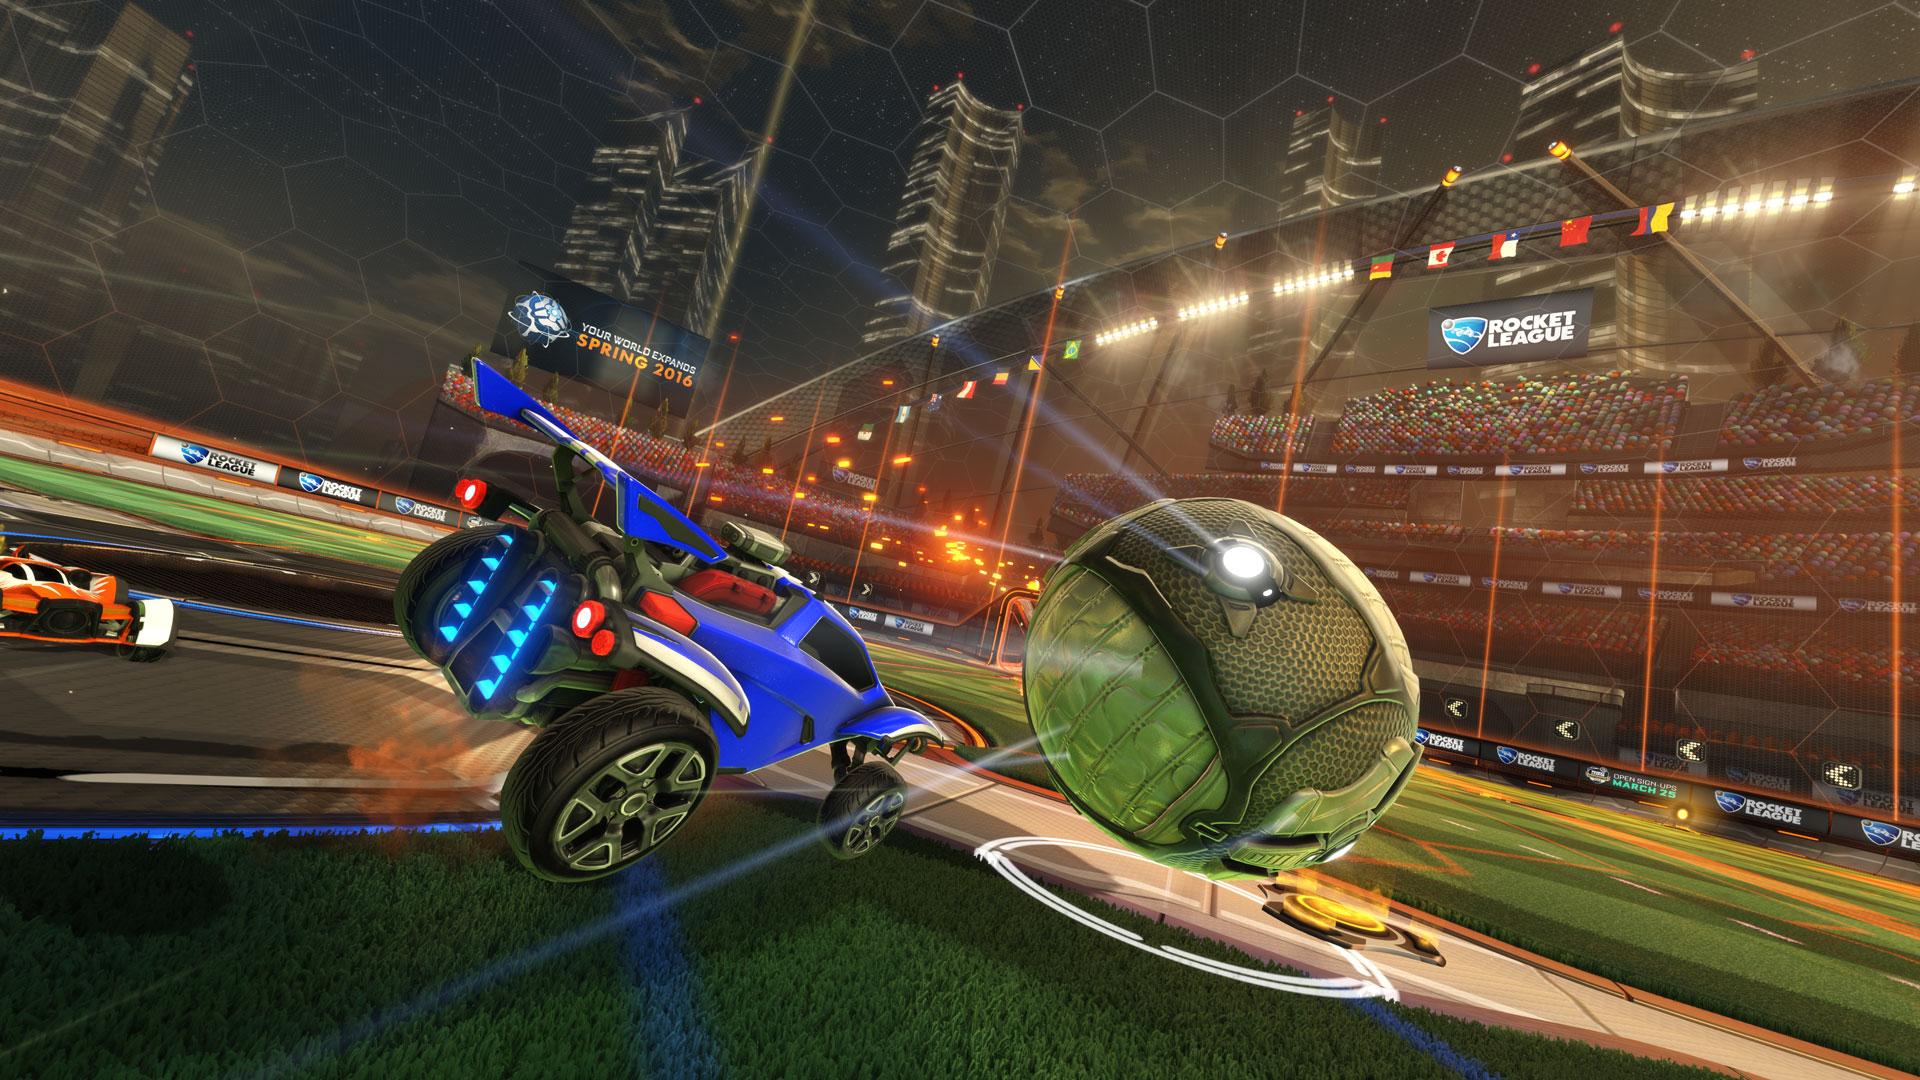 Custom controller, esports, esports event, pro gamer, controller accessories, custom xbox one controller, custom ps4 controller, Rocket League